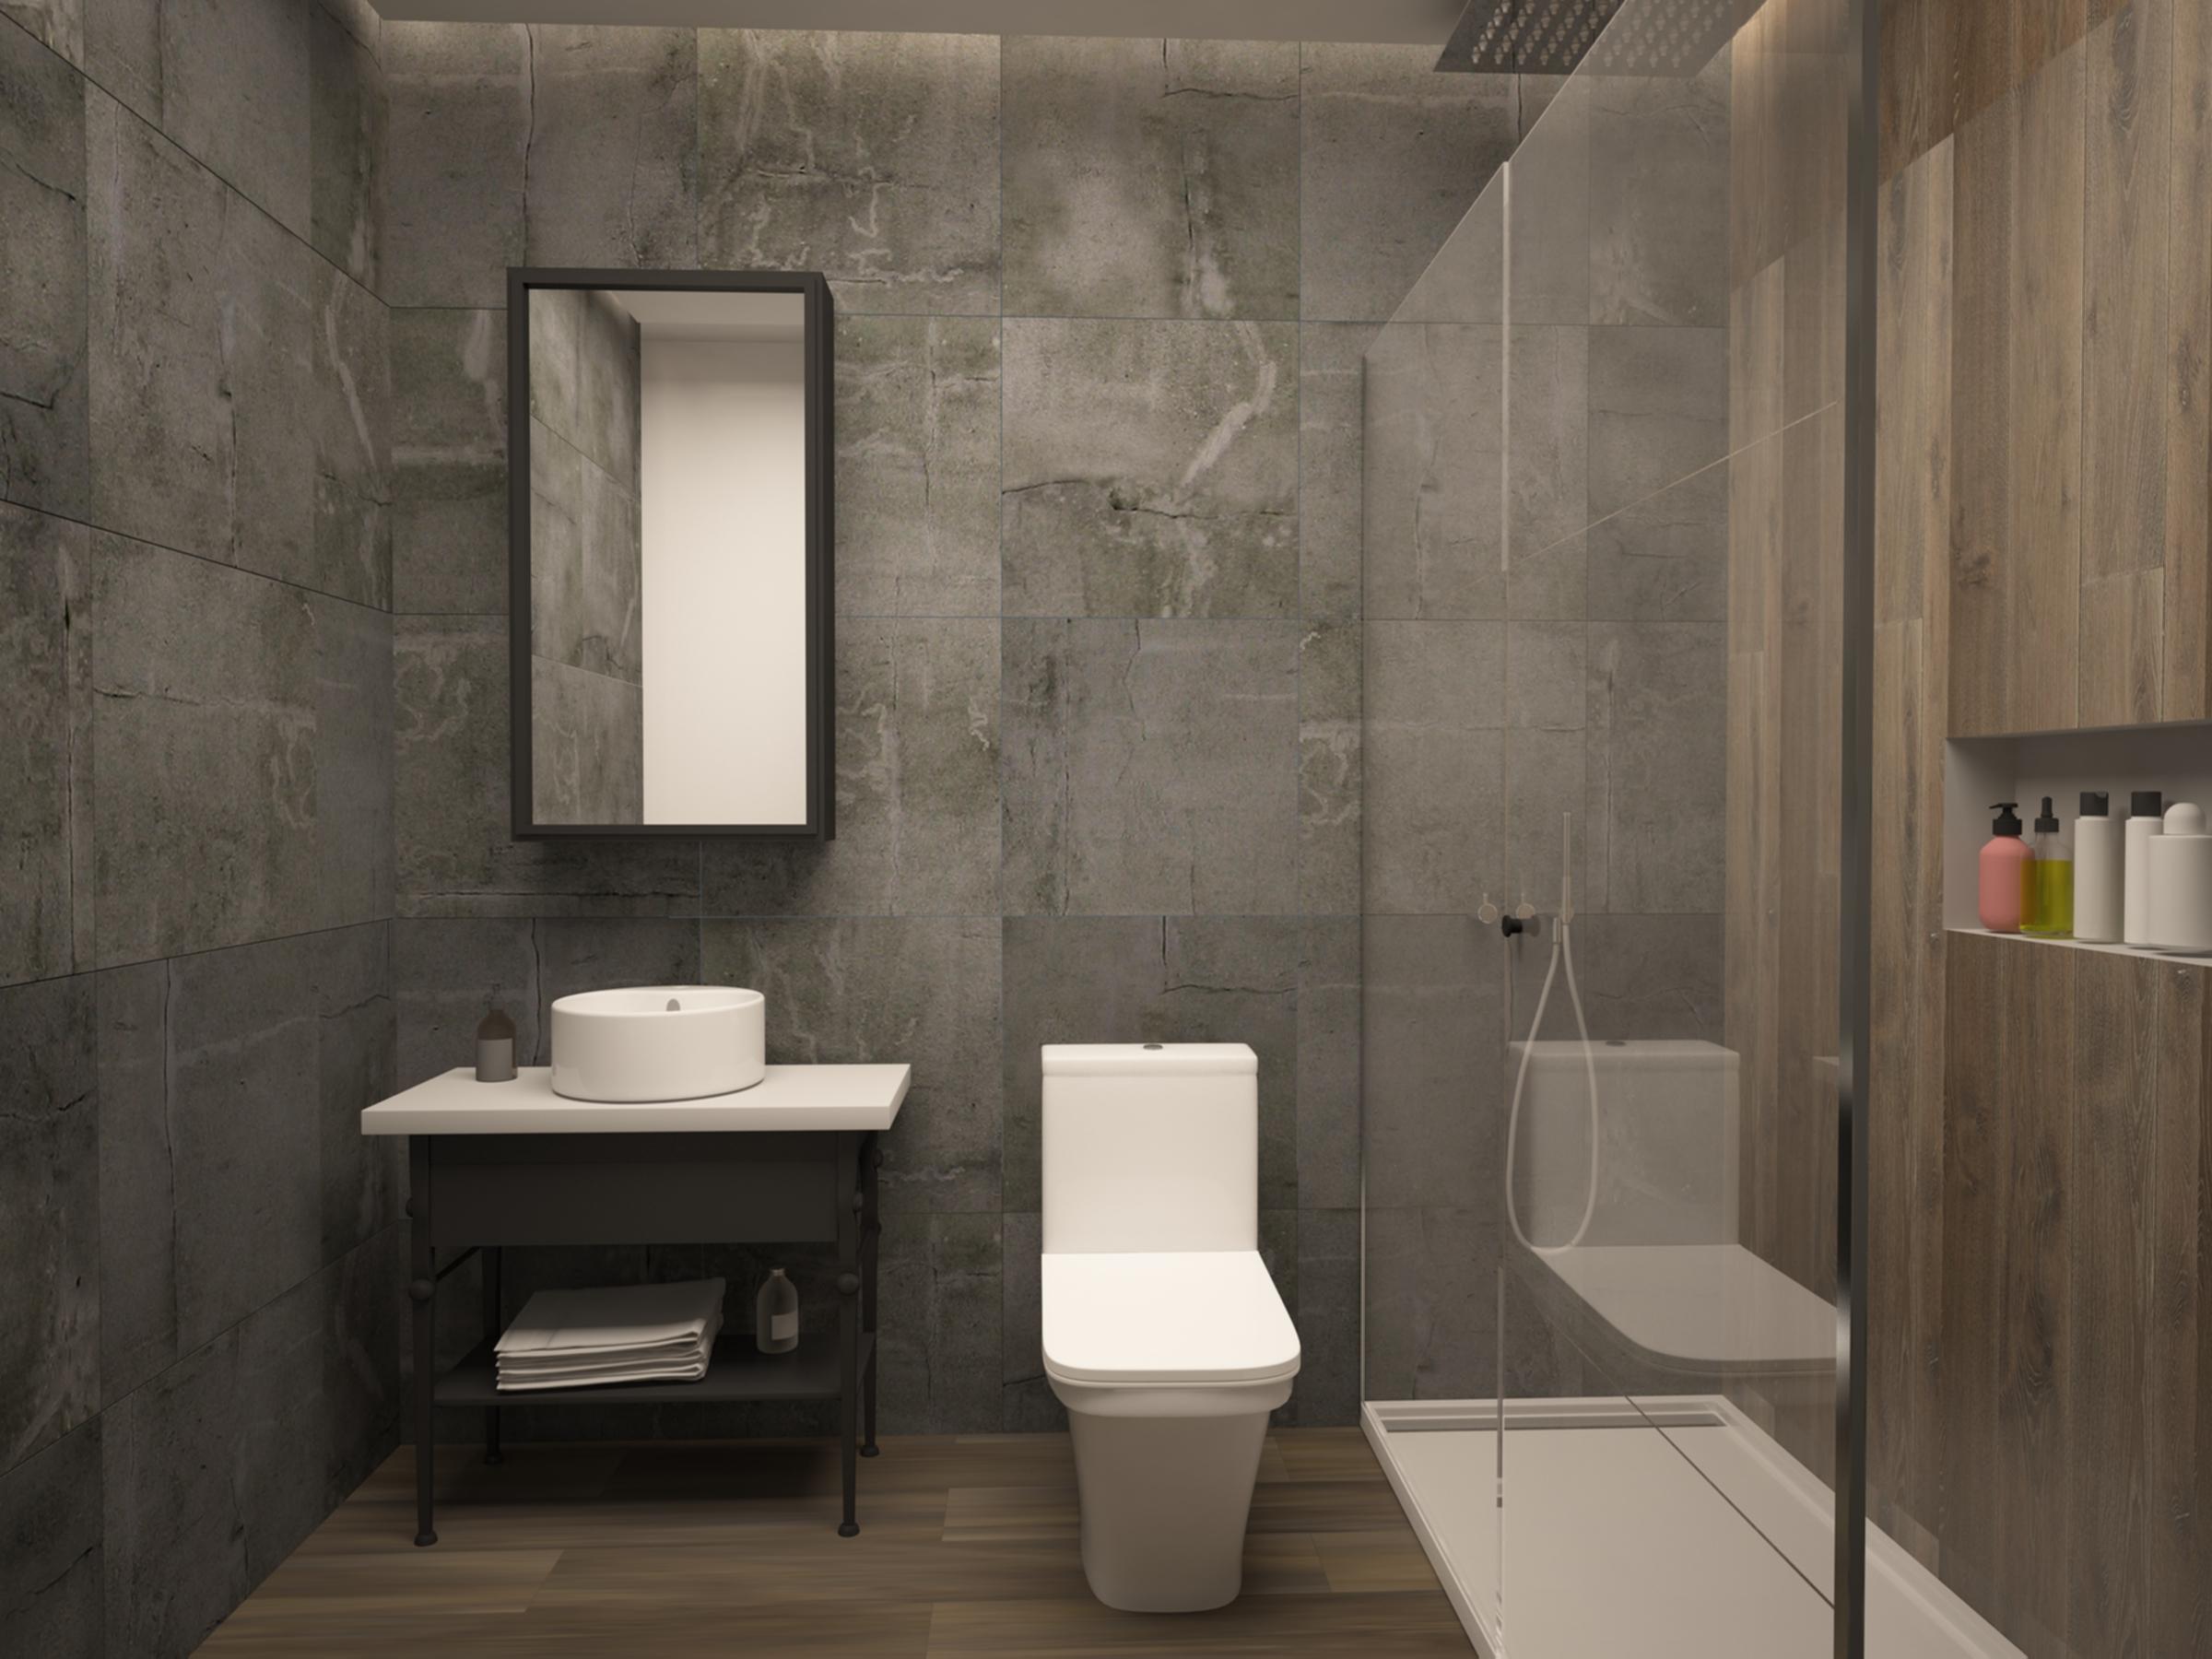 Guest Bathroom in Apartment for Sale in Baraka Residence in Nyarutarama, Kigali